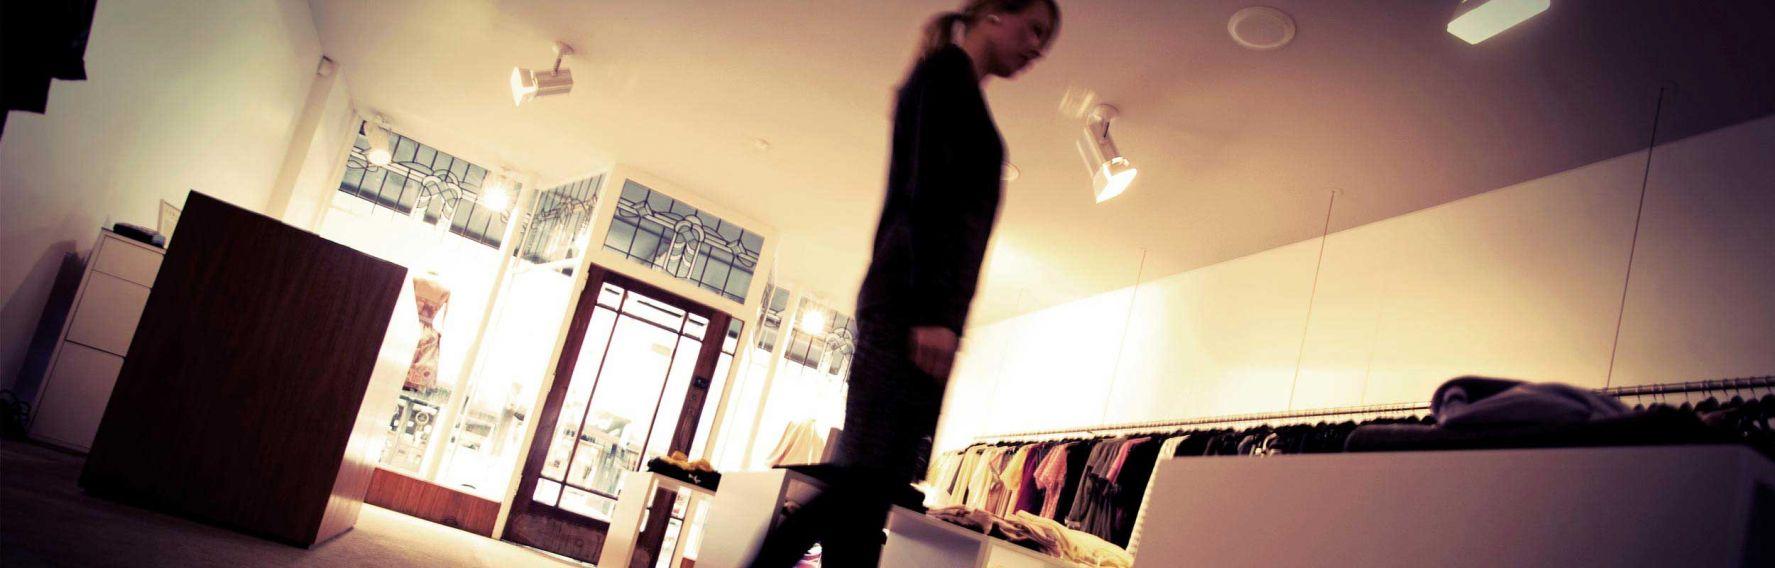 Dunedin designer store